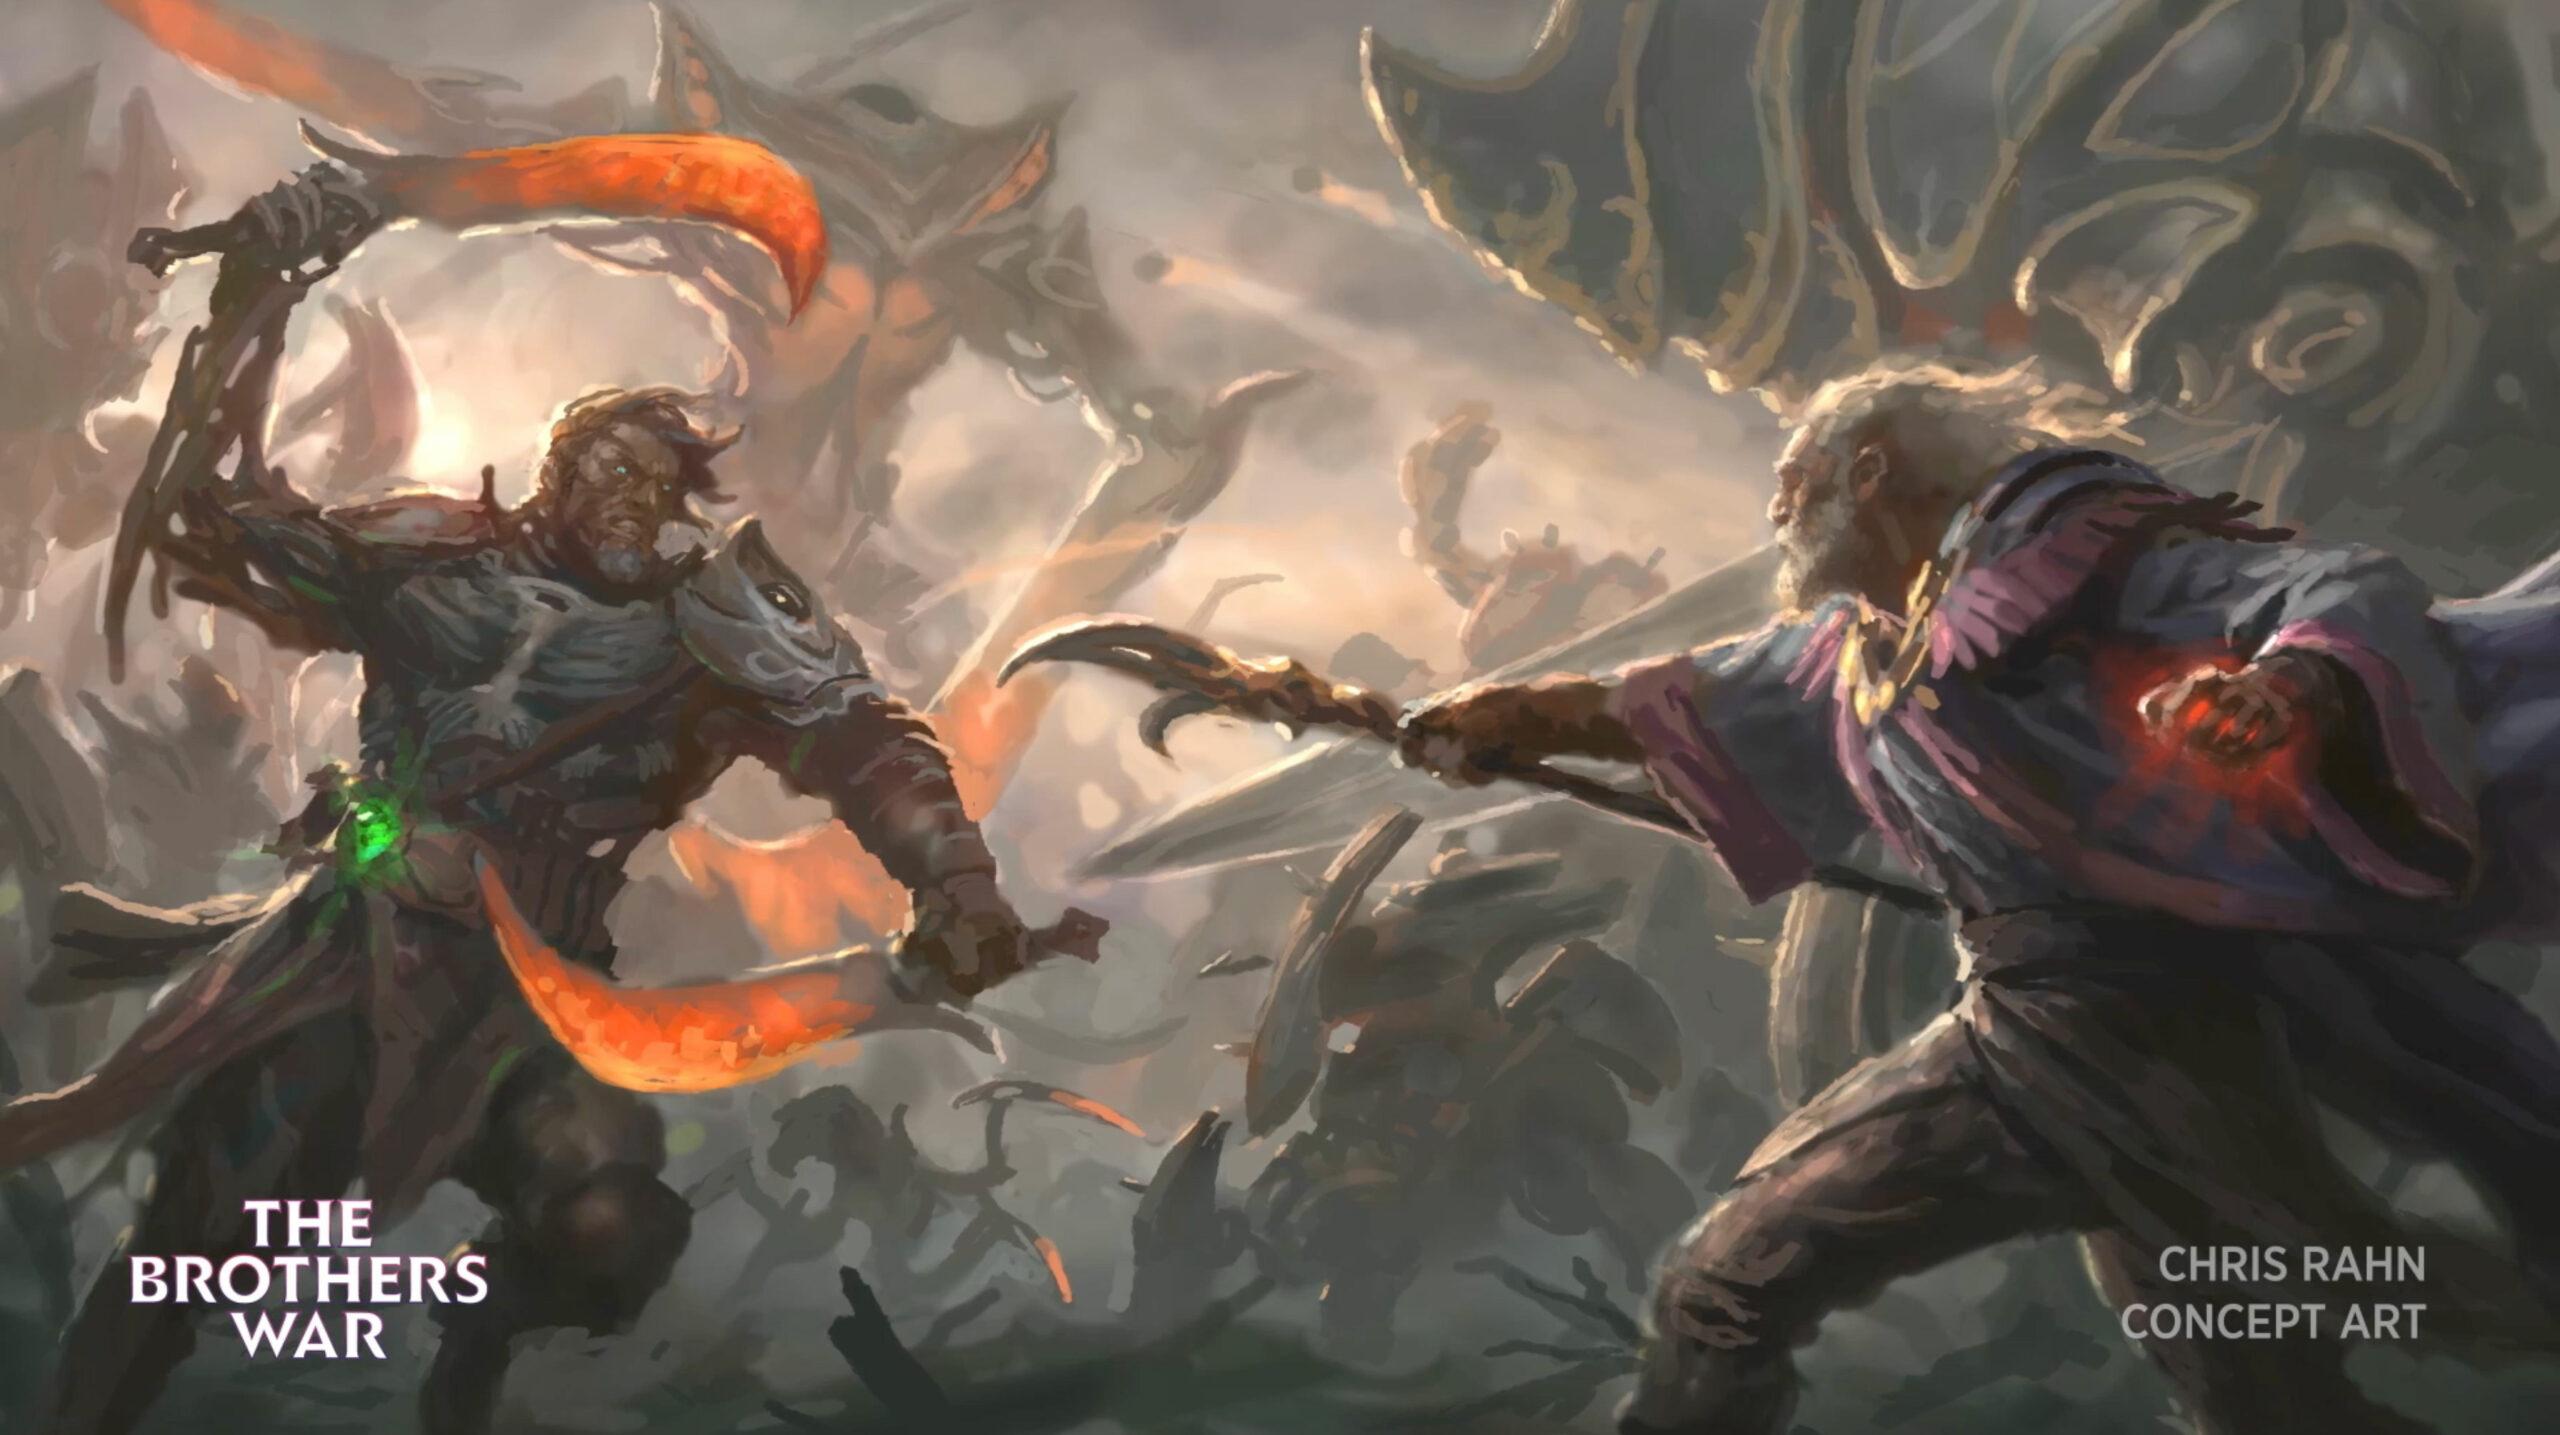 brothers-war-concept-art-chris-rahn-scaled